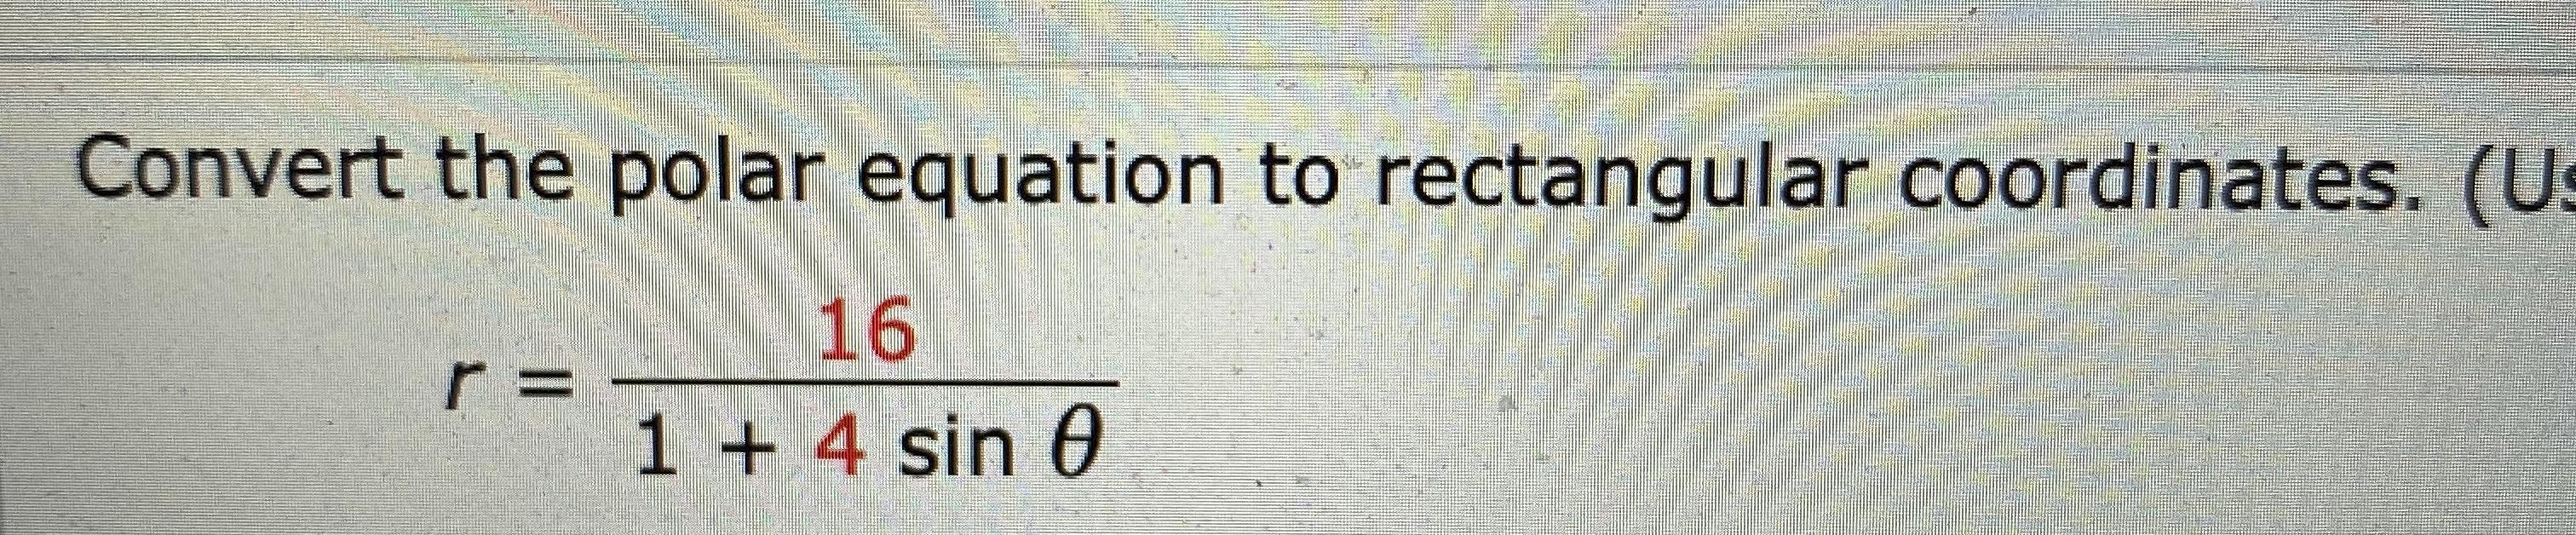 Convert the polar equation to rectangular coordinates. (Us 16 r = 1 +4 sin e